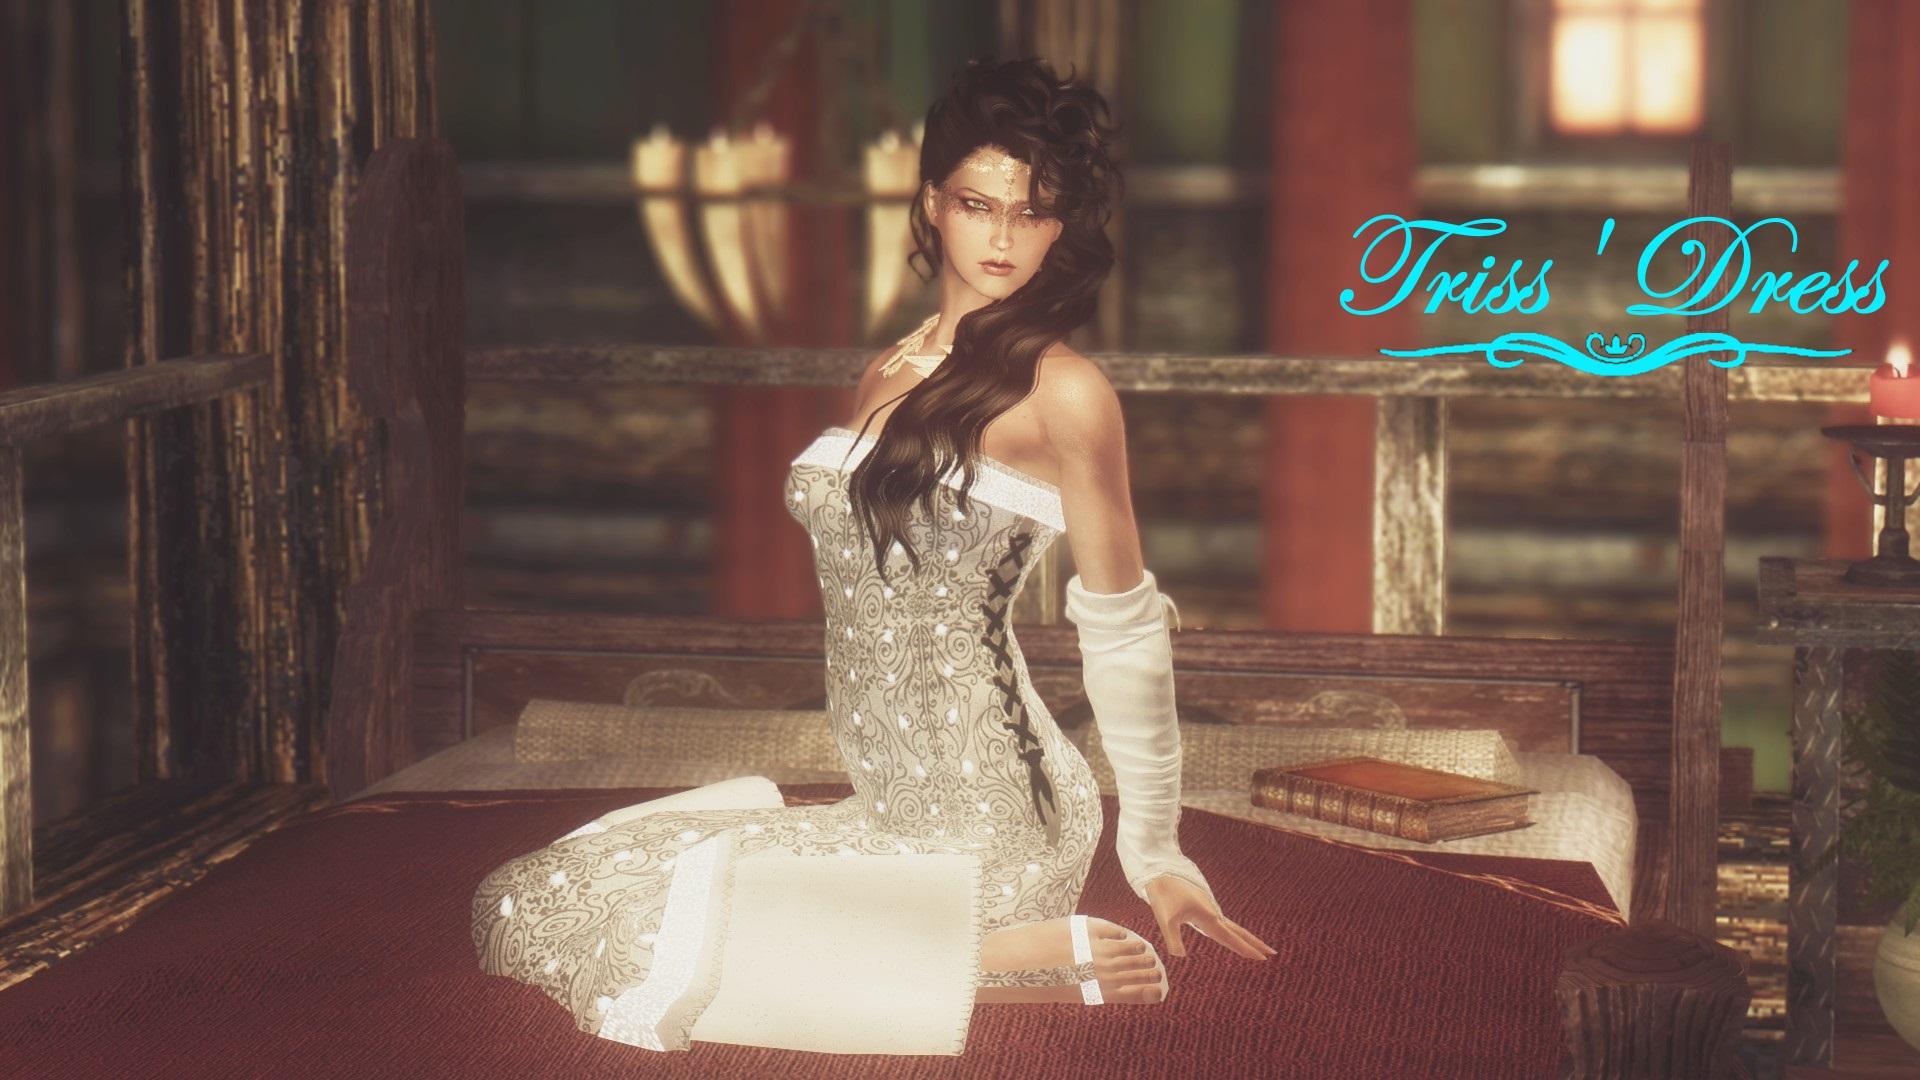 Triss'_Dress.jpg